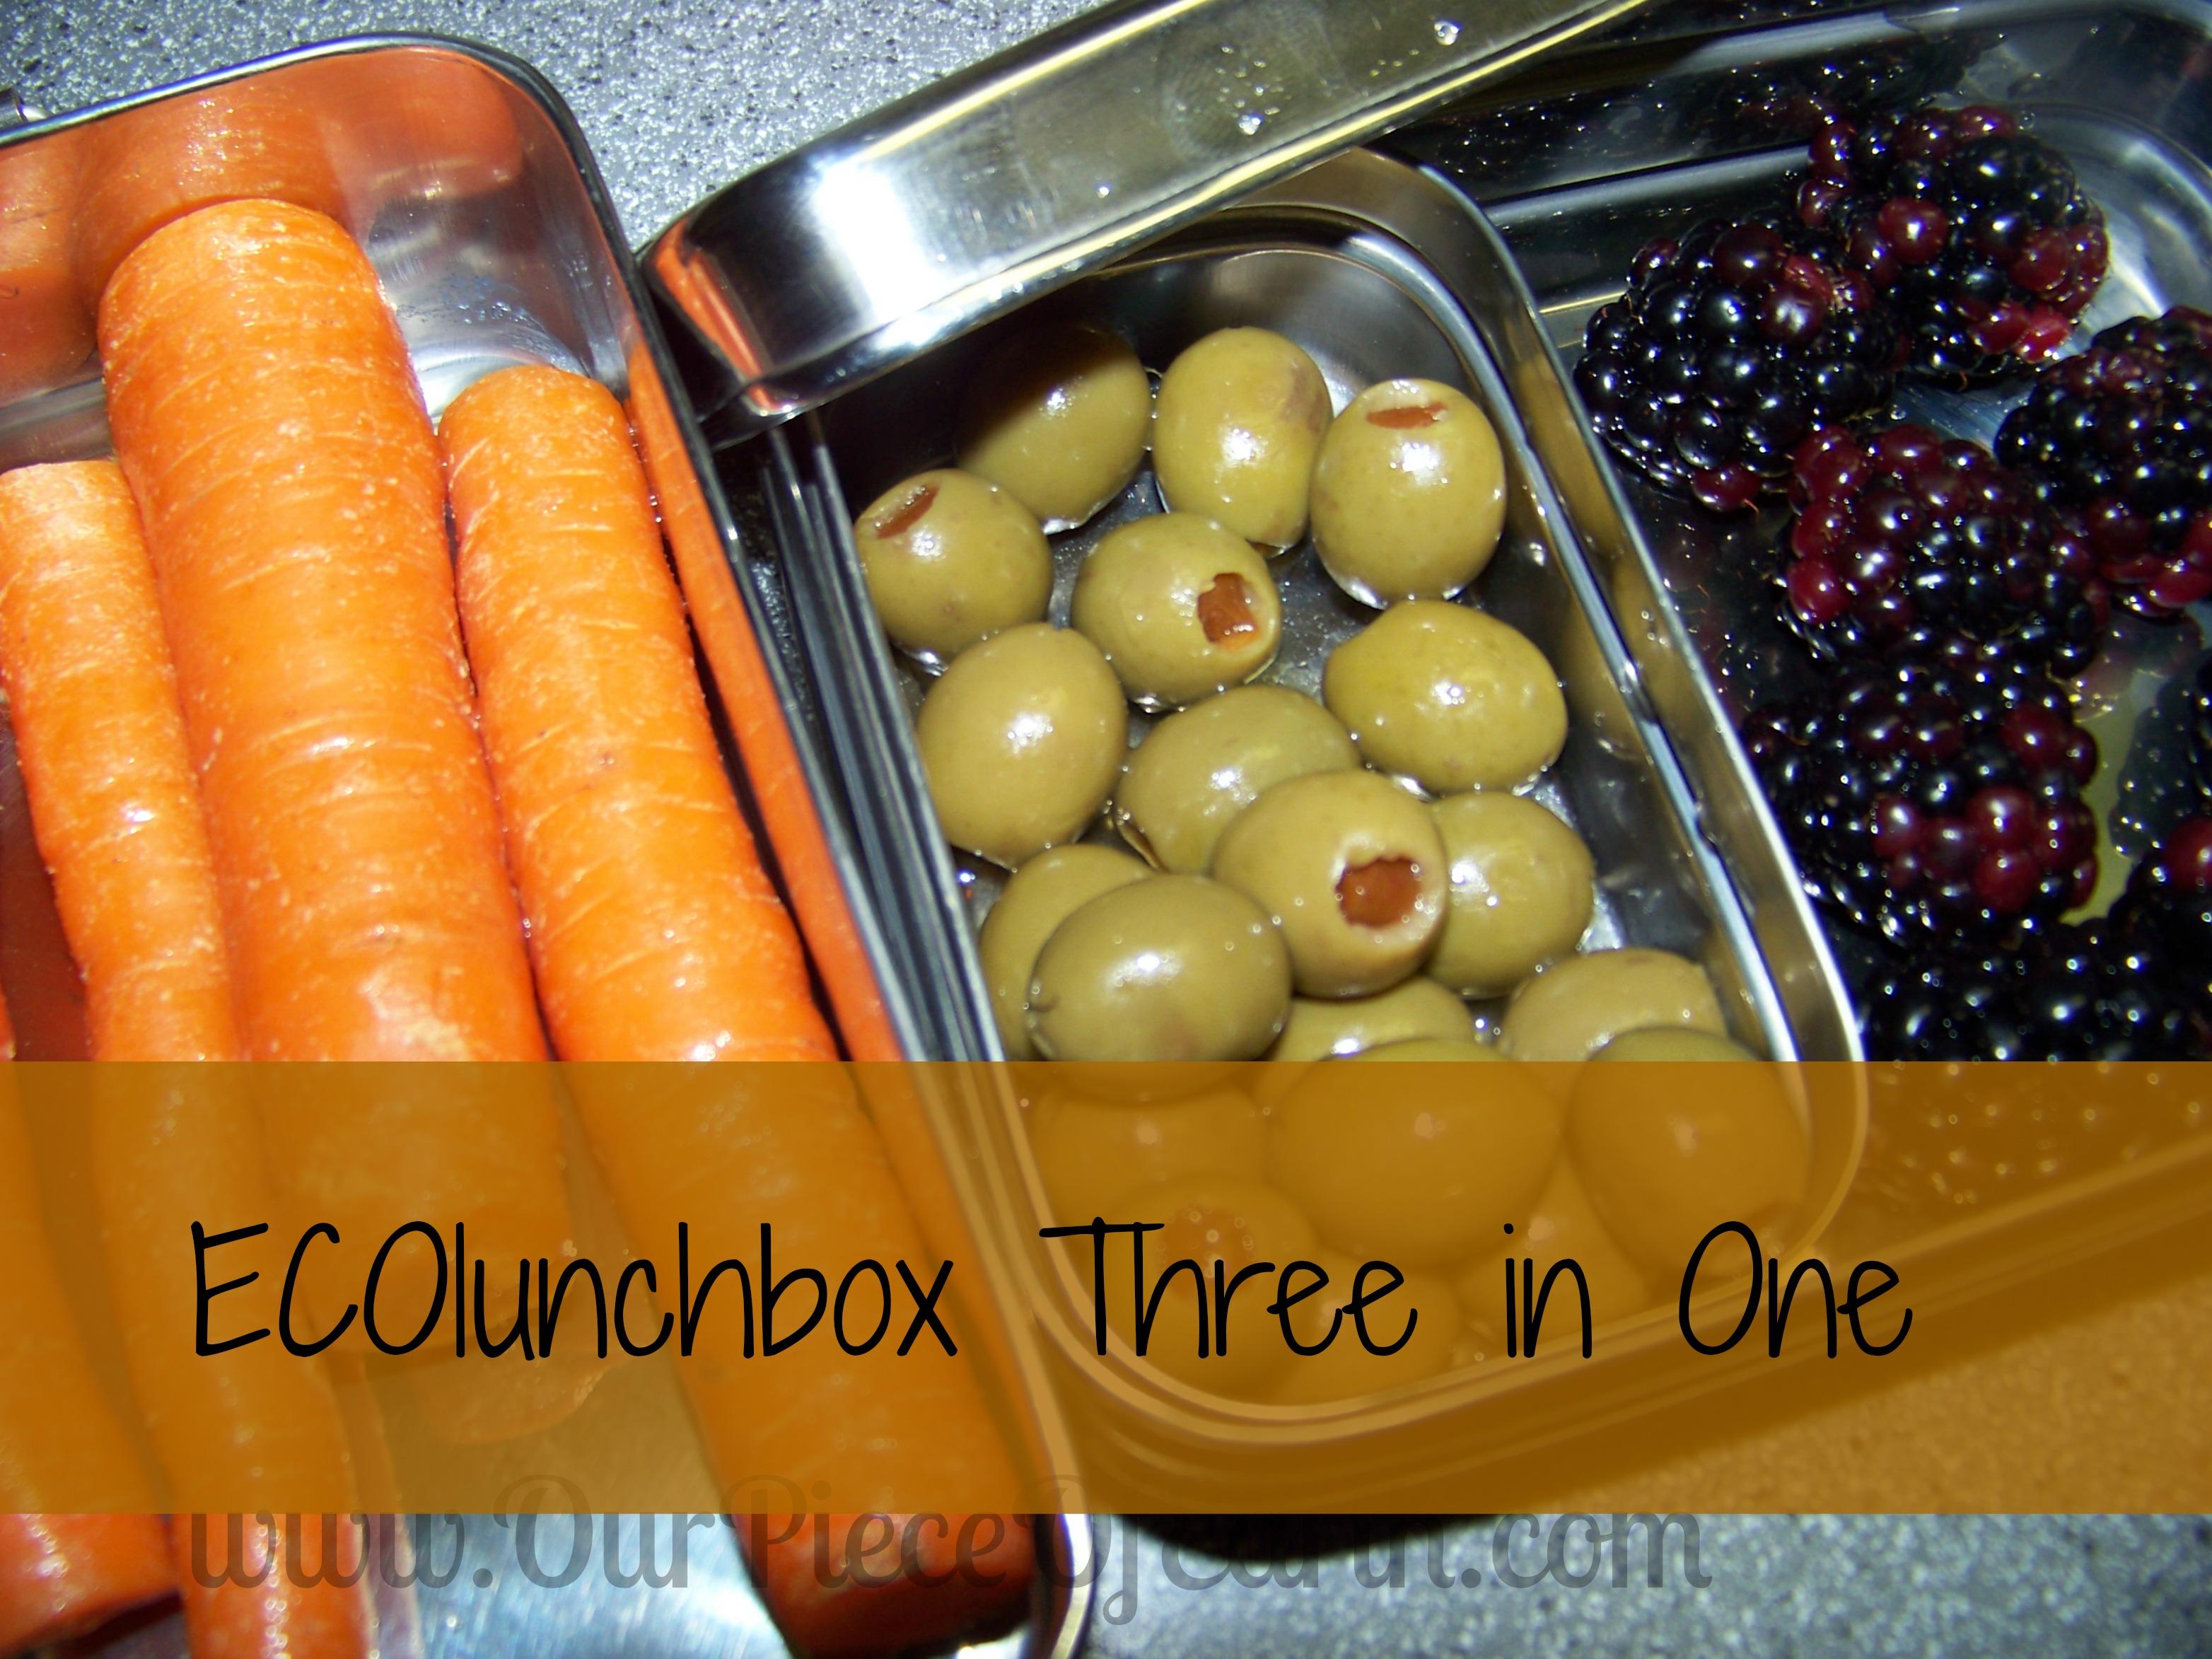 ECOlunchbox 3 in 1